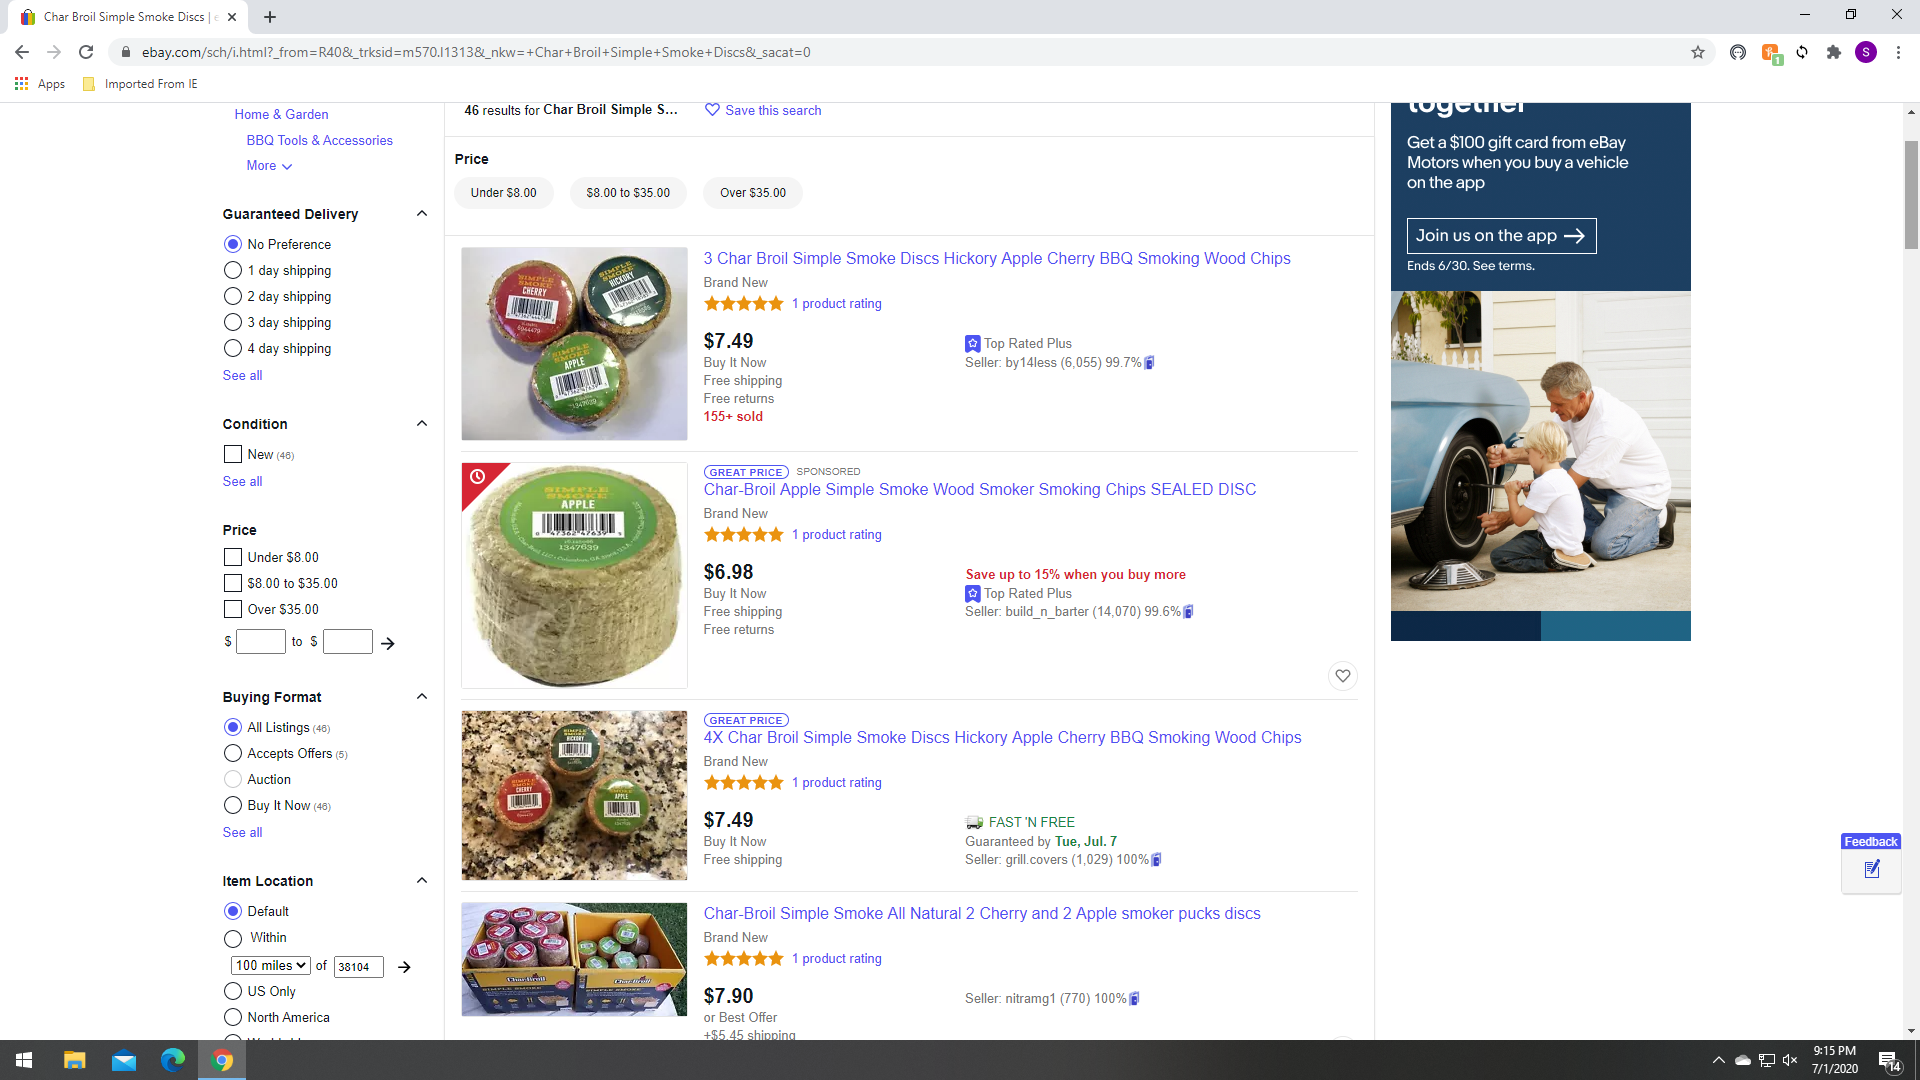 Ebay Endorsement Great Price Icon Similar To Spons The Ebay Community